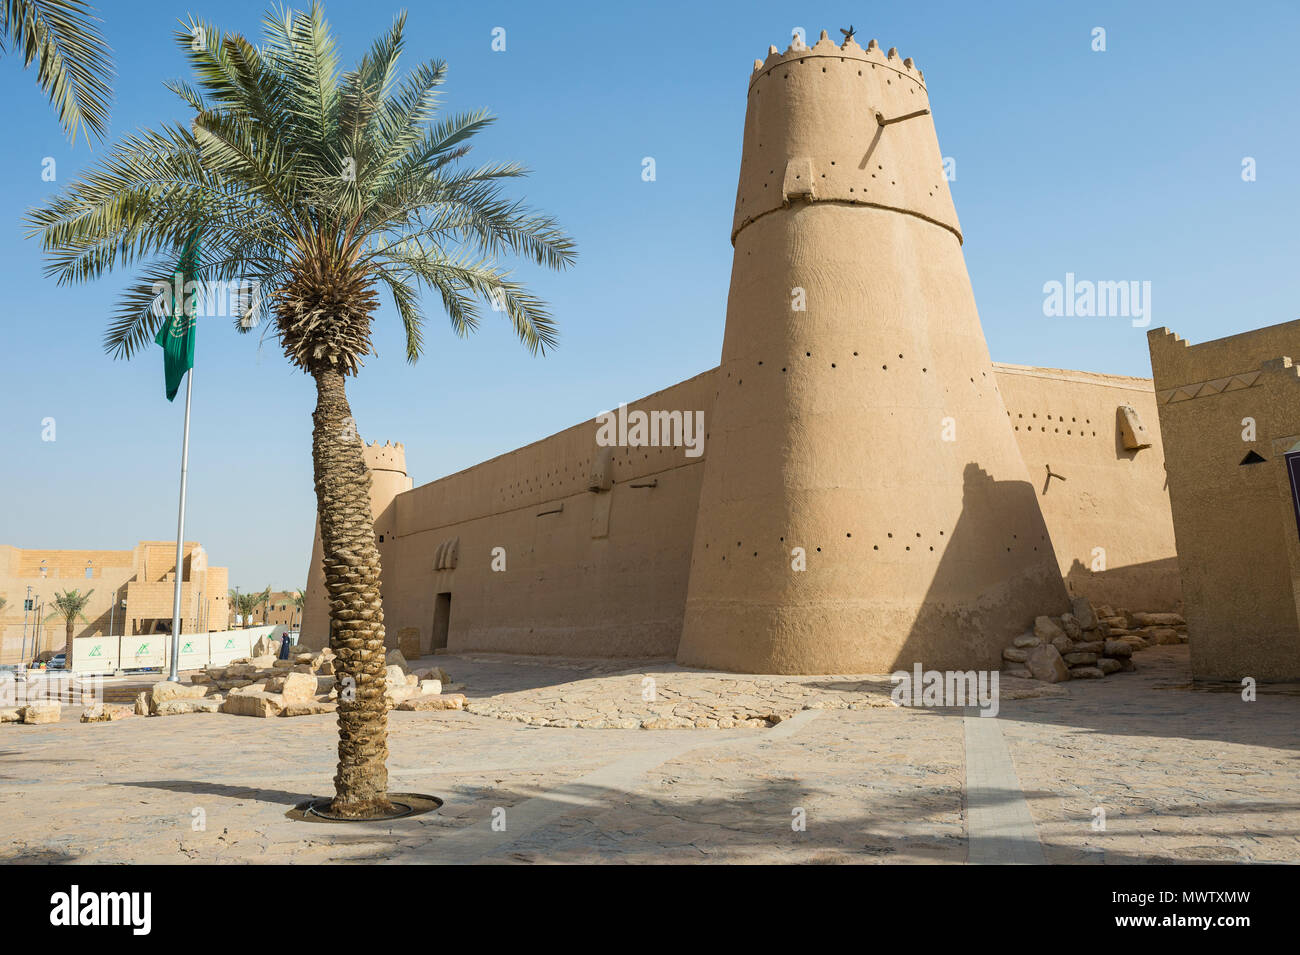 Masmak Fort, Riyadh, Arabie saoudite, Moyen Orient Photo Stock